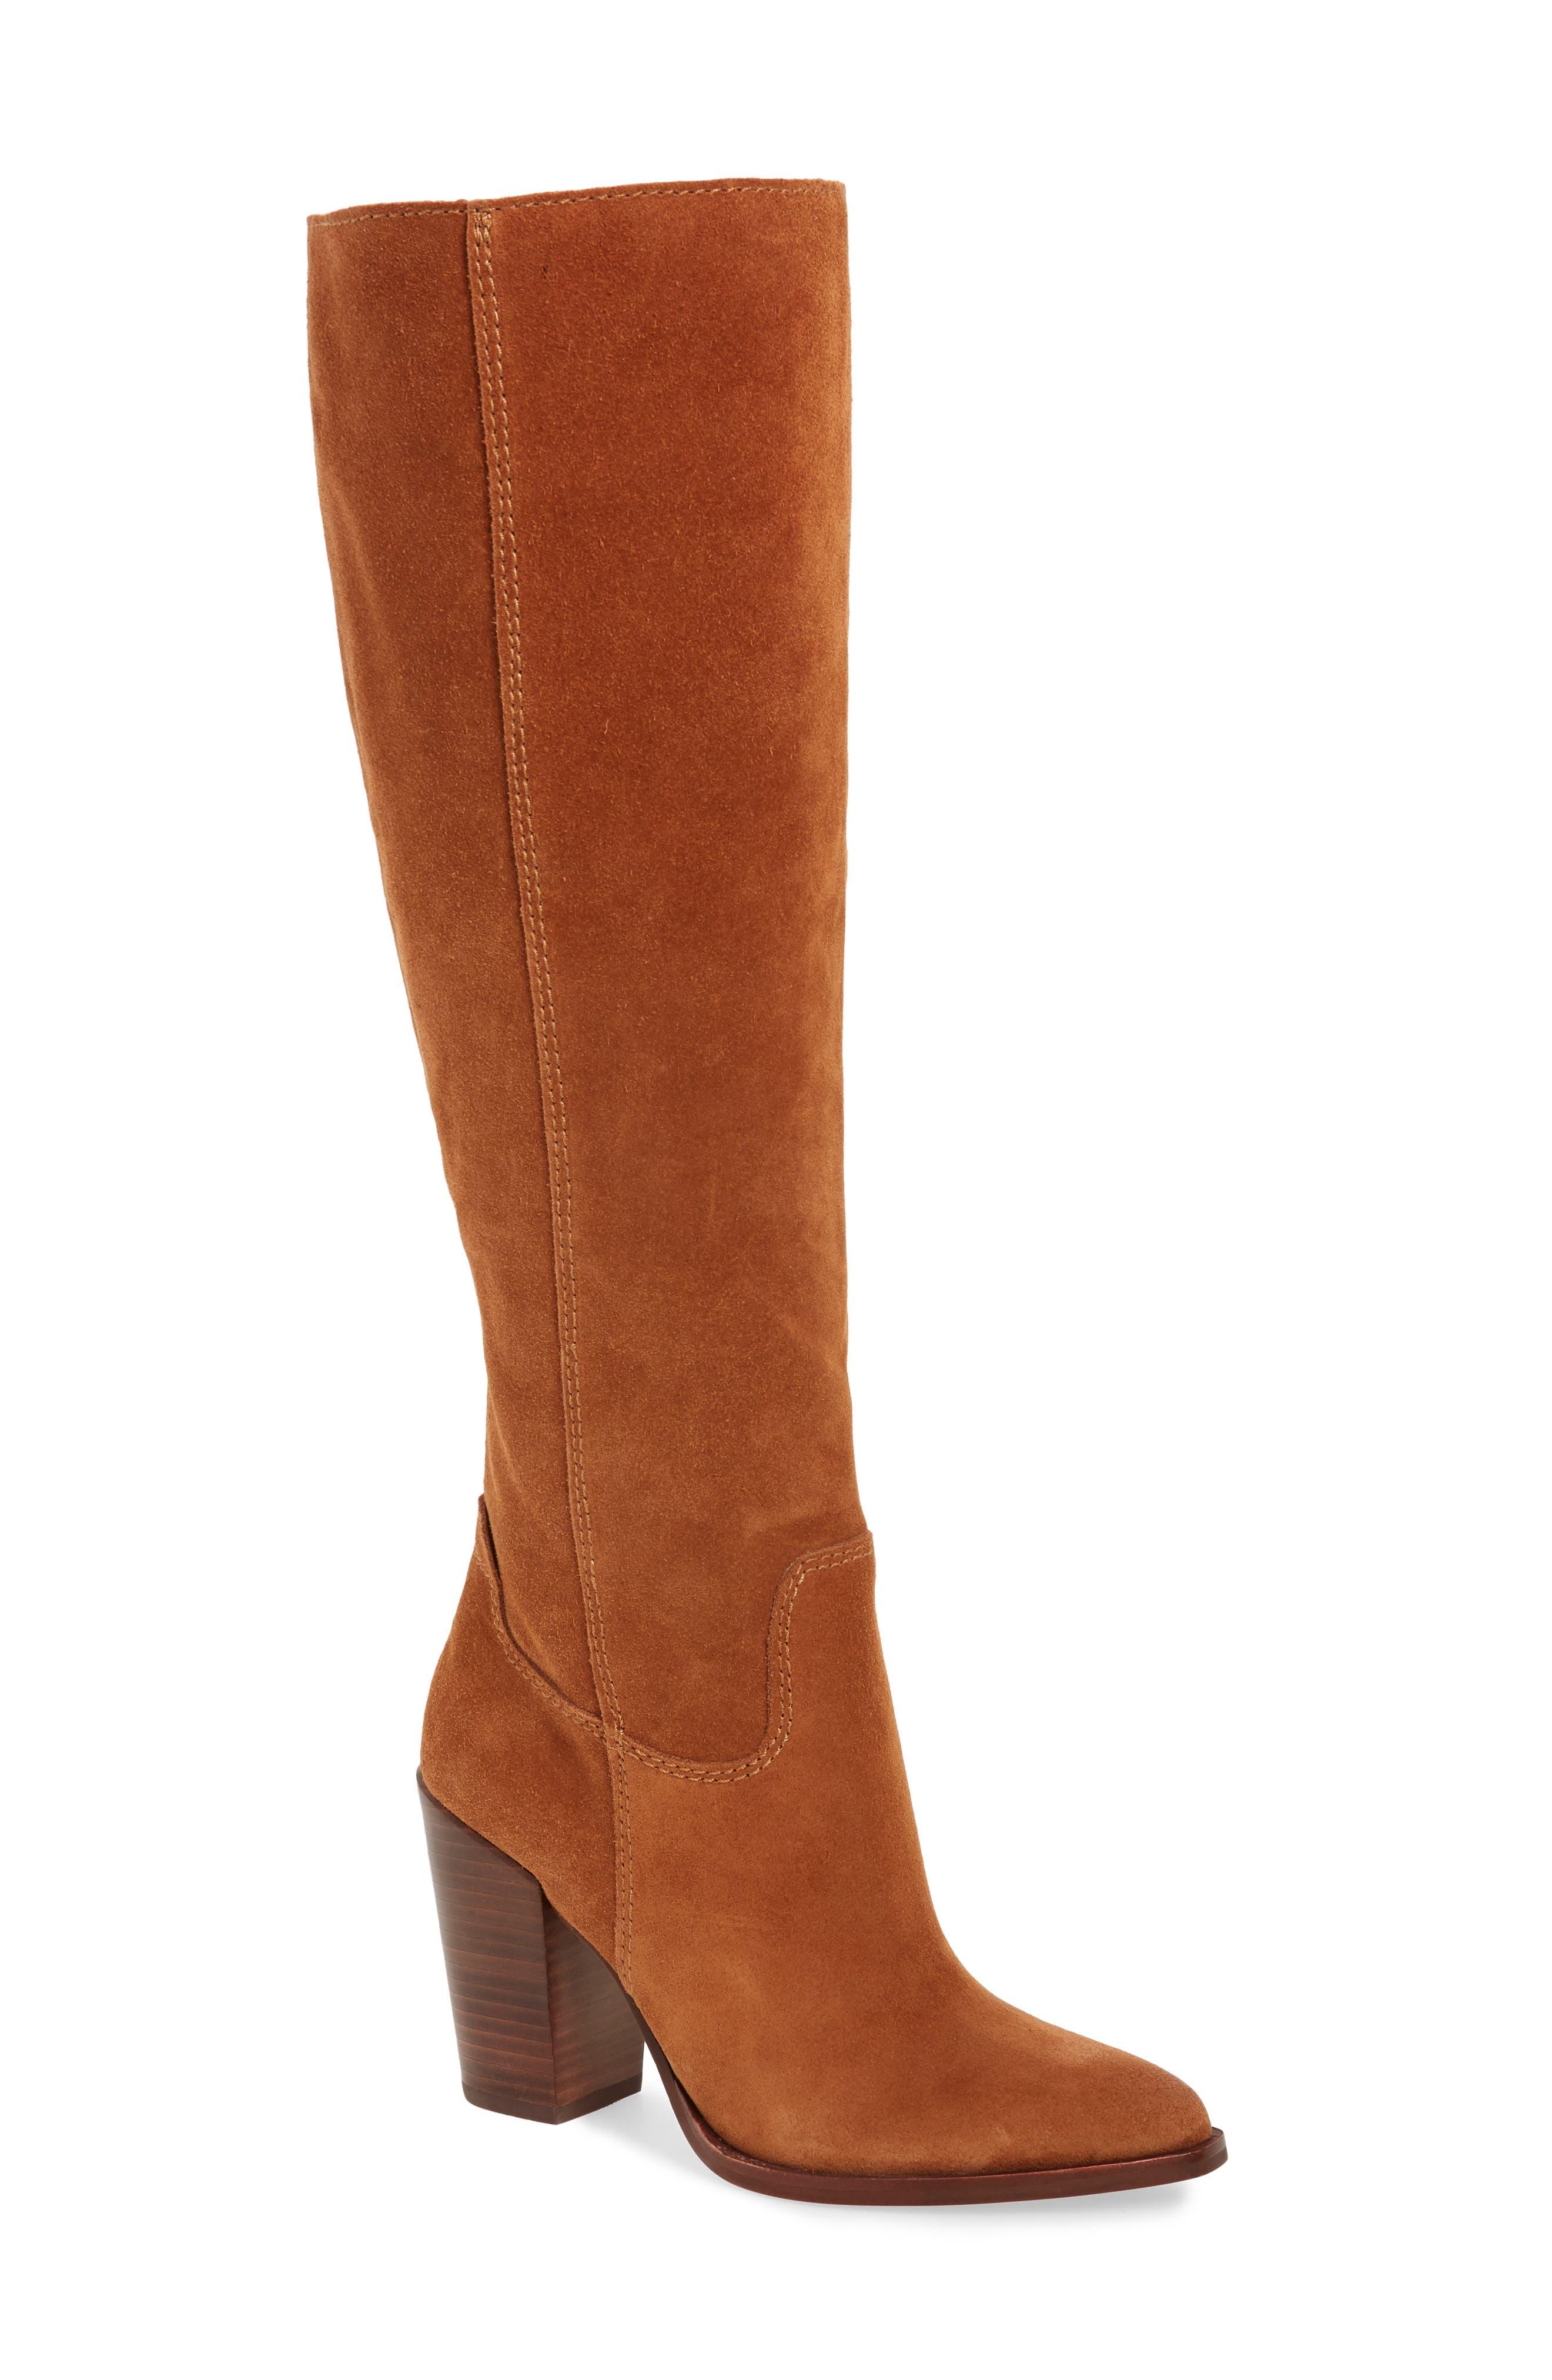 Dolce Vita Kylar Knee High Boot, Brown